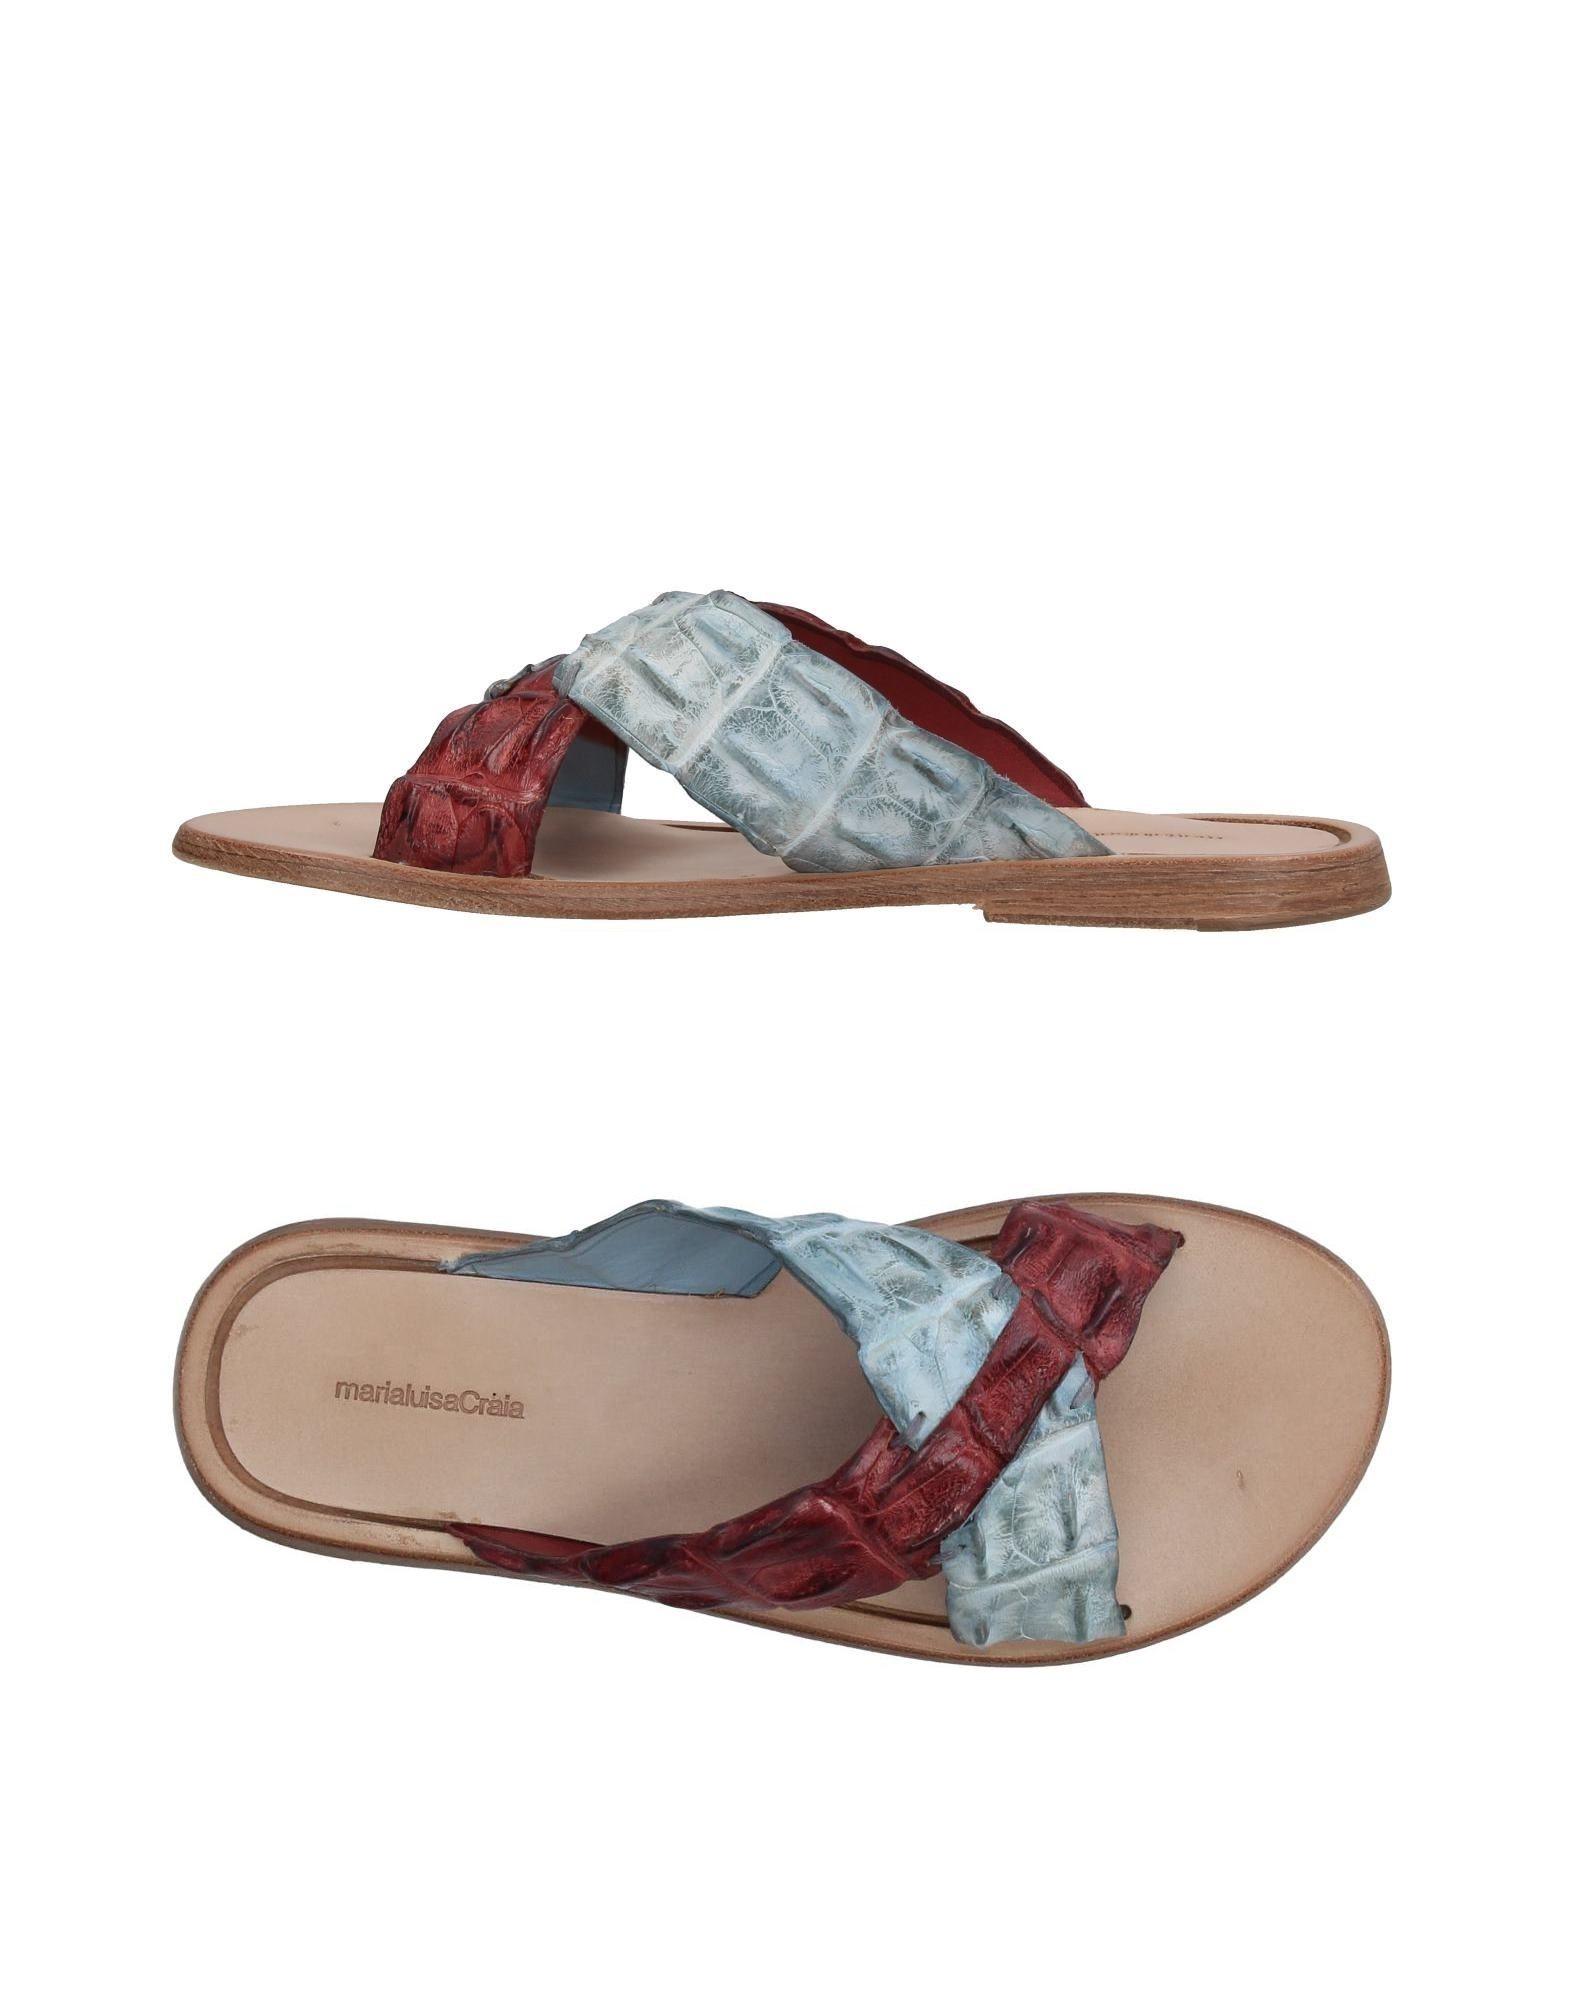 Marialuisa Craia Sandalen Damen  11378511CF Gute Qualität beliebte Schuhe